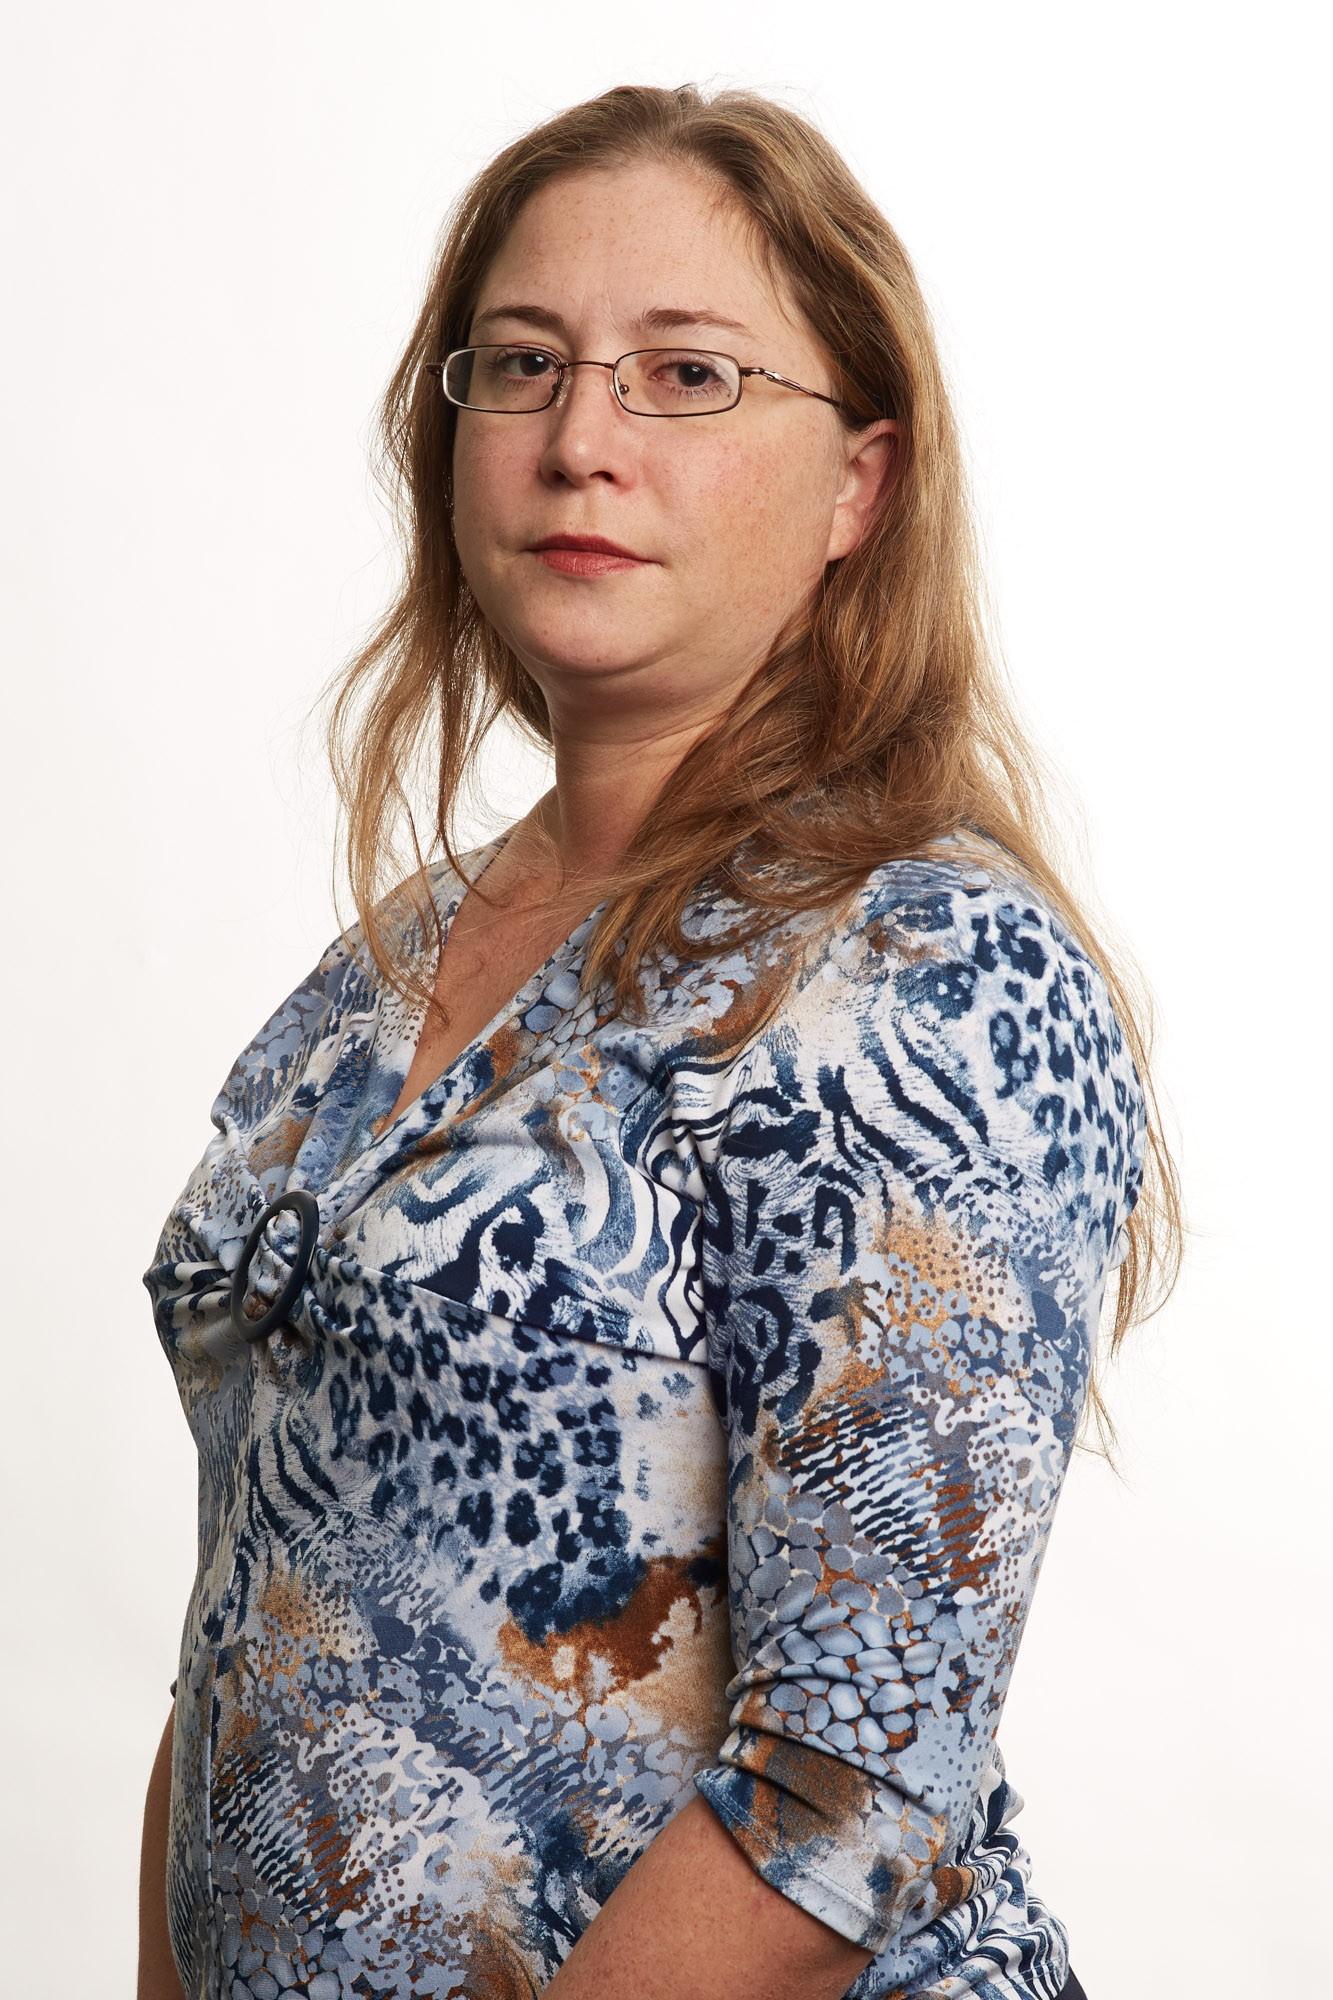 Photo of Sarah C. Duncan, M.D.